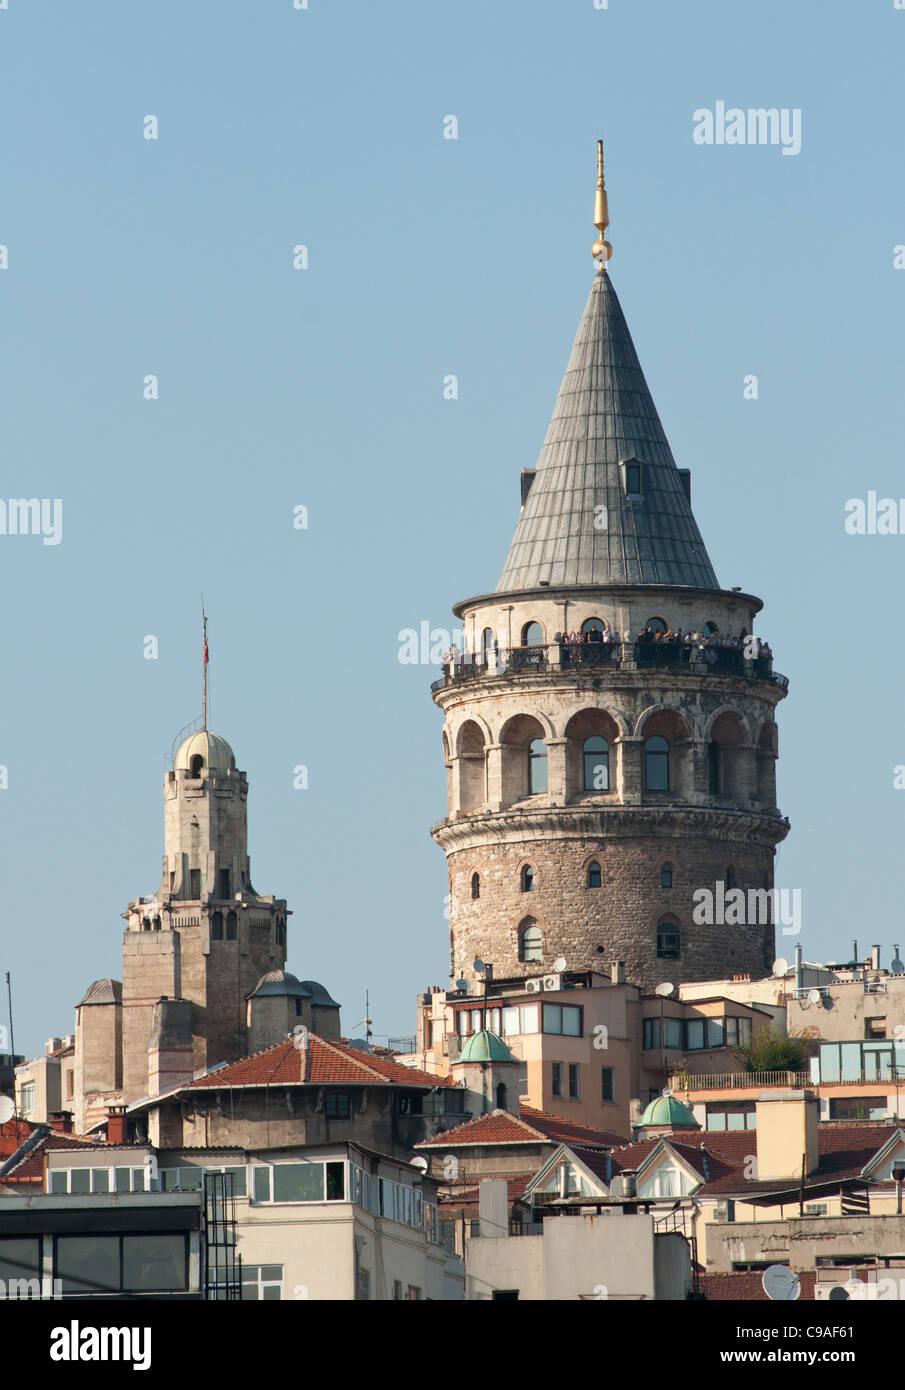 Galata Tower, Medieval Genoese Stone Tower in Istanbul, Beyoglu, Turkey. - Stock Image